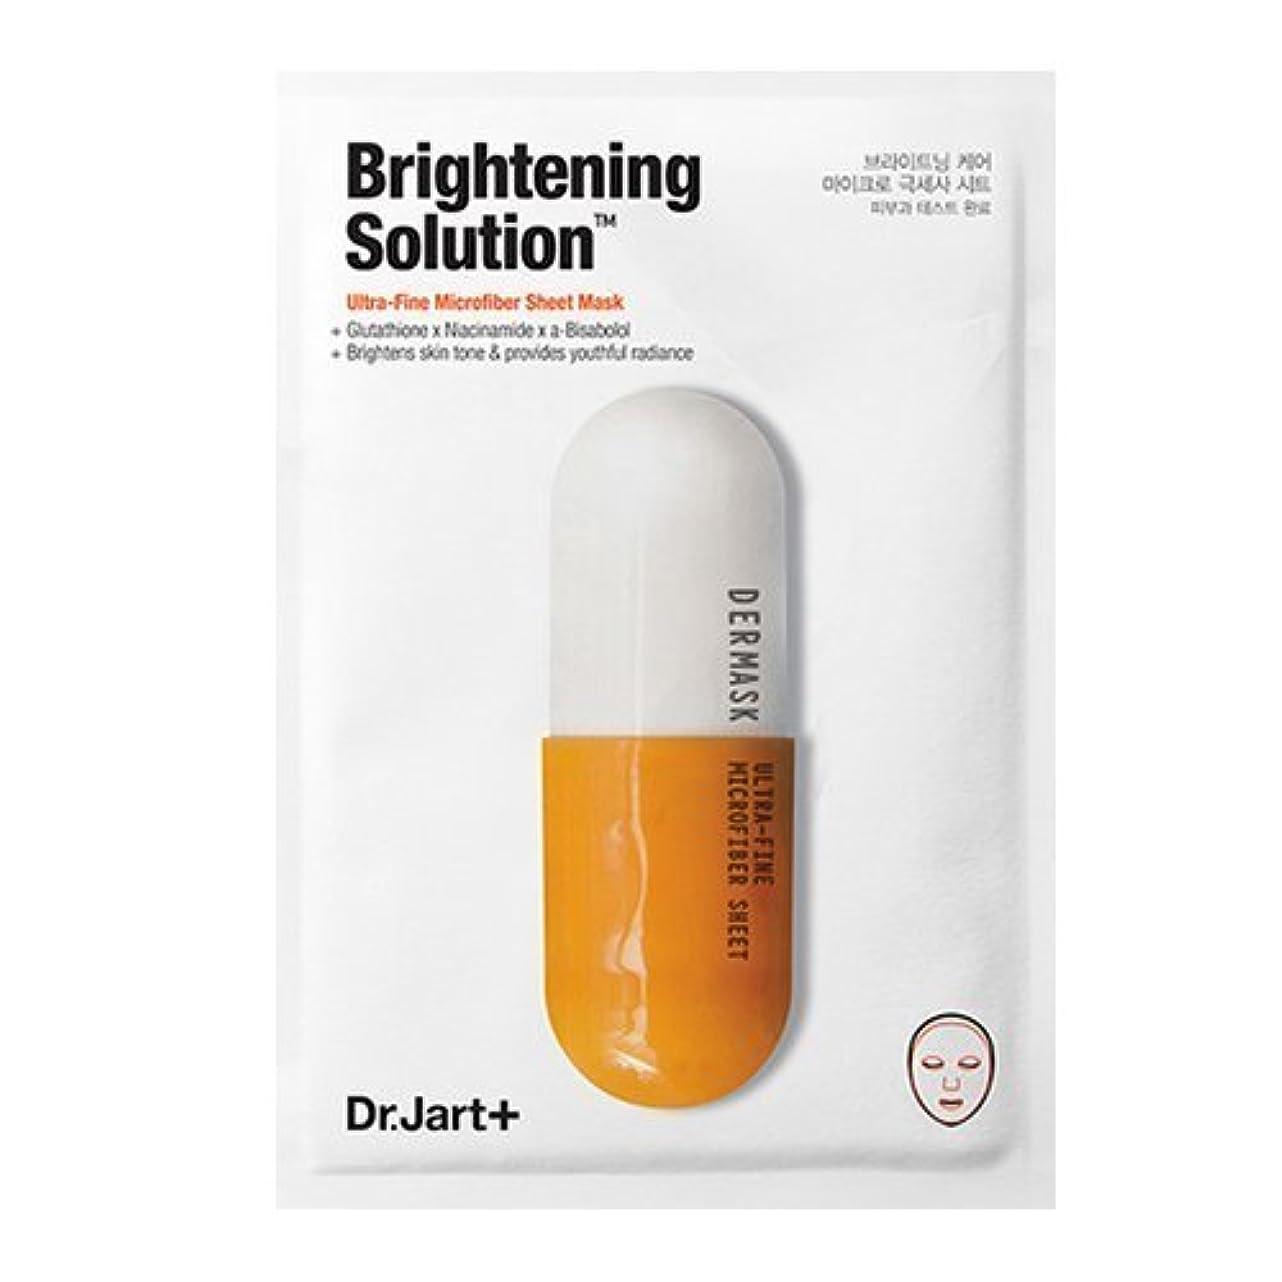 Dr. Jart [dr.jart +] dermaskマイクロジェット白液1EA [並行輸入品]